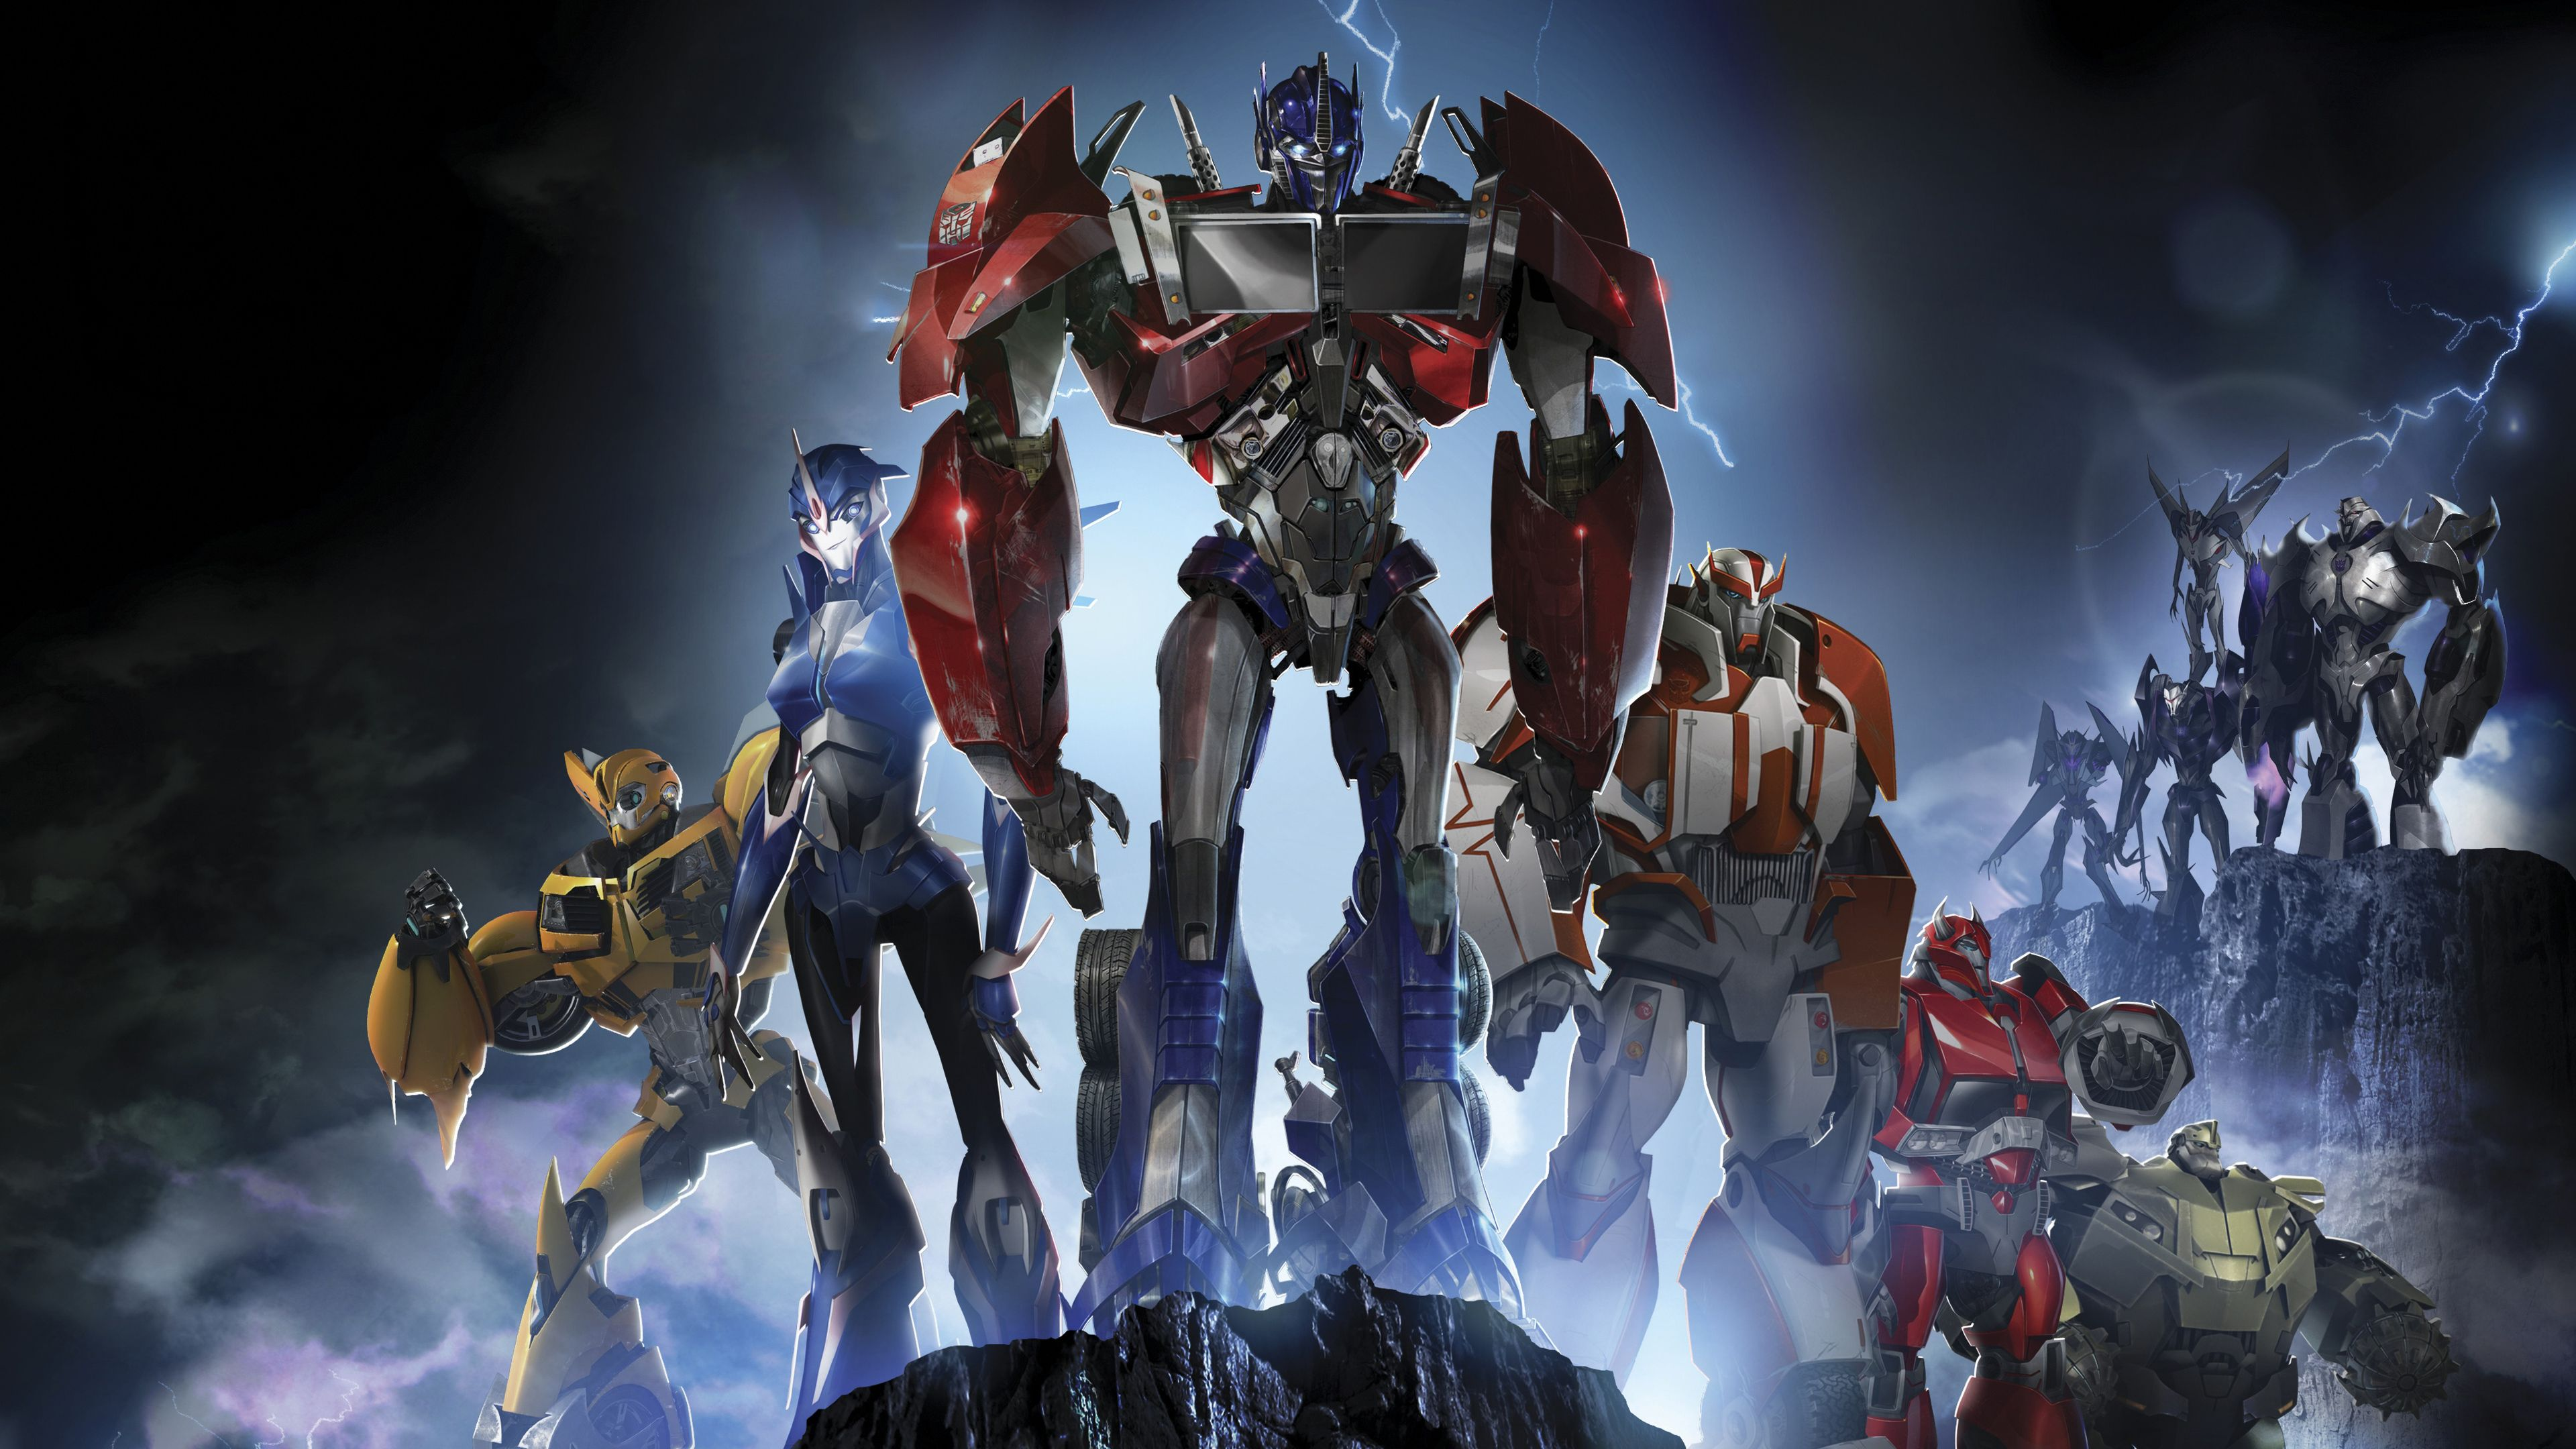 Wallpaper 4k Transformers Prime 4k 4kwallpapers, hd